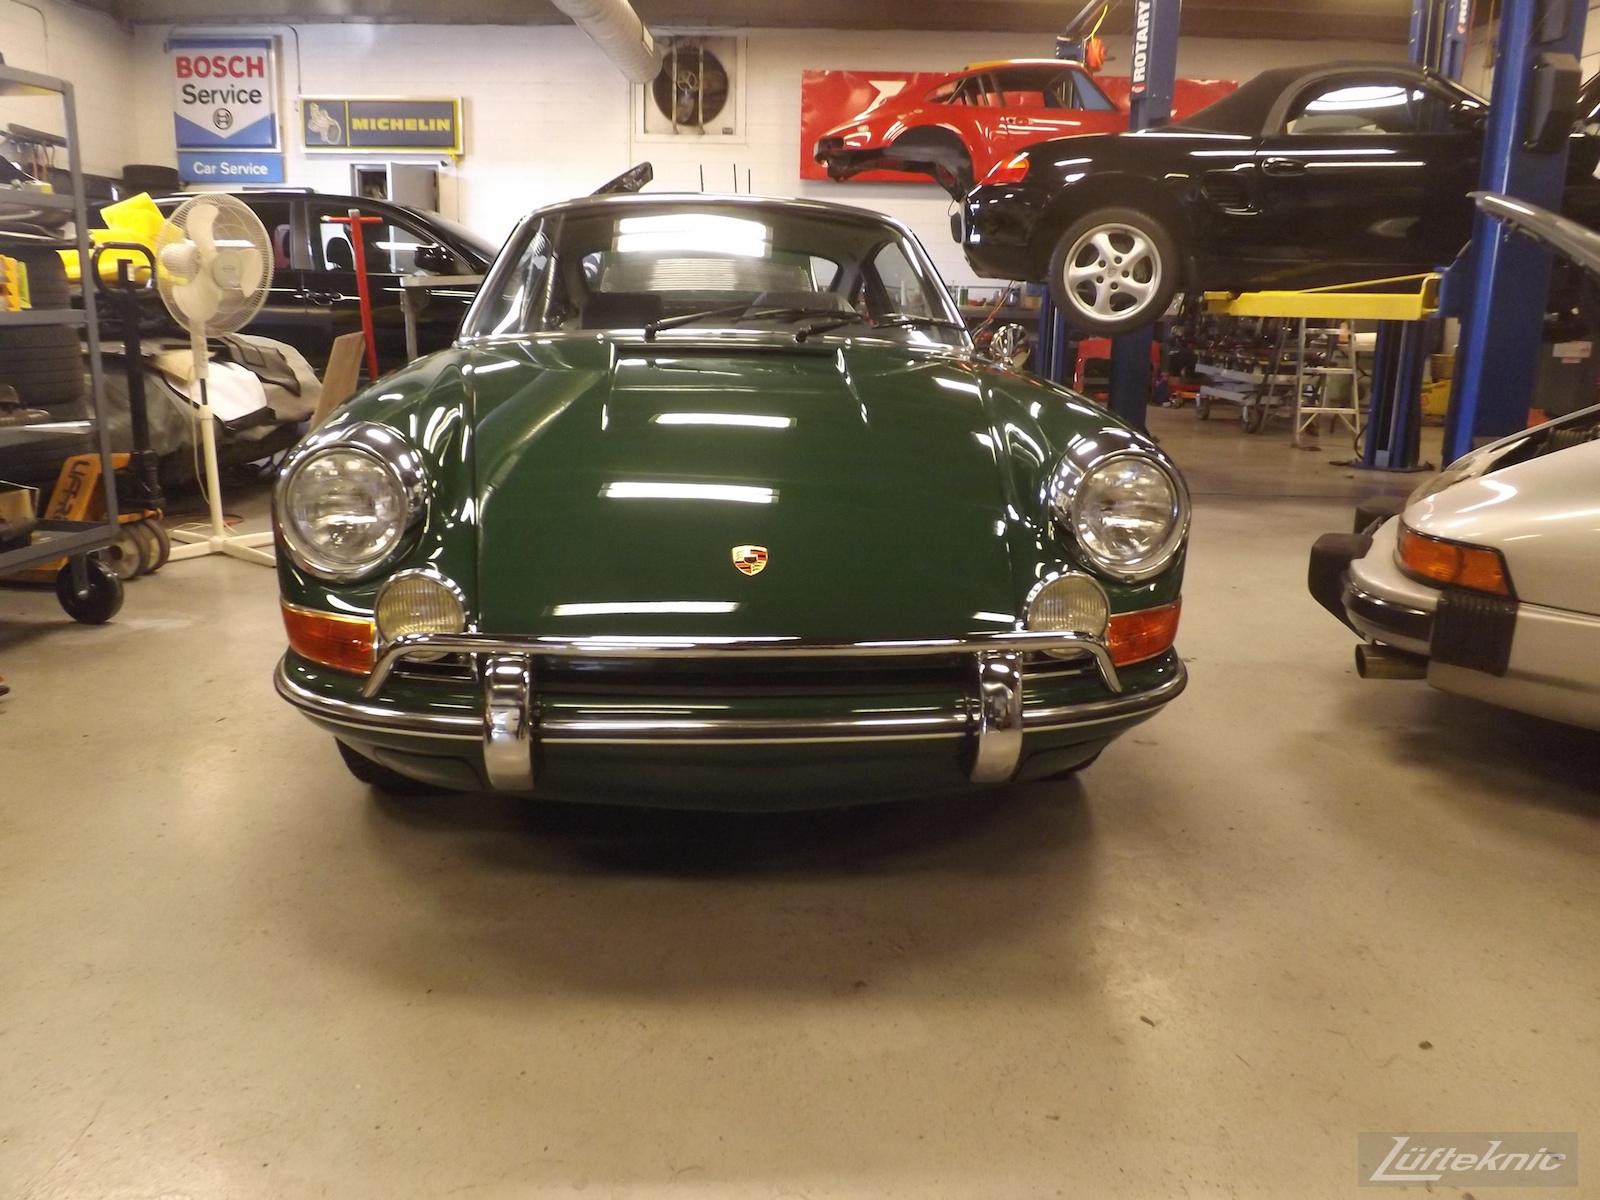 A freshly restored Irish Green Porsche 912 sits inside the Lufteknic shop.